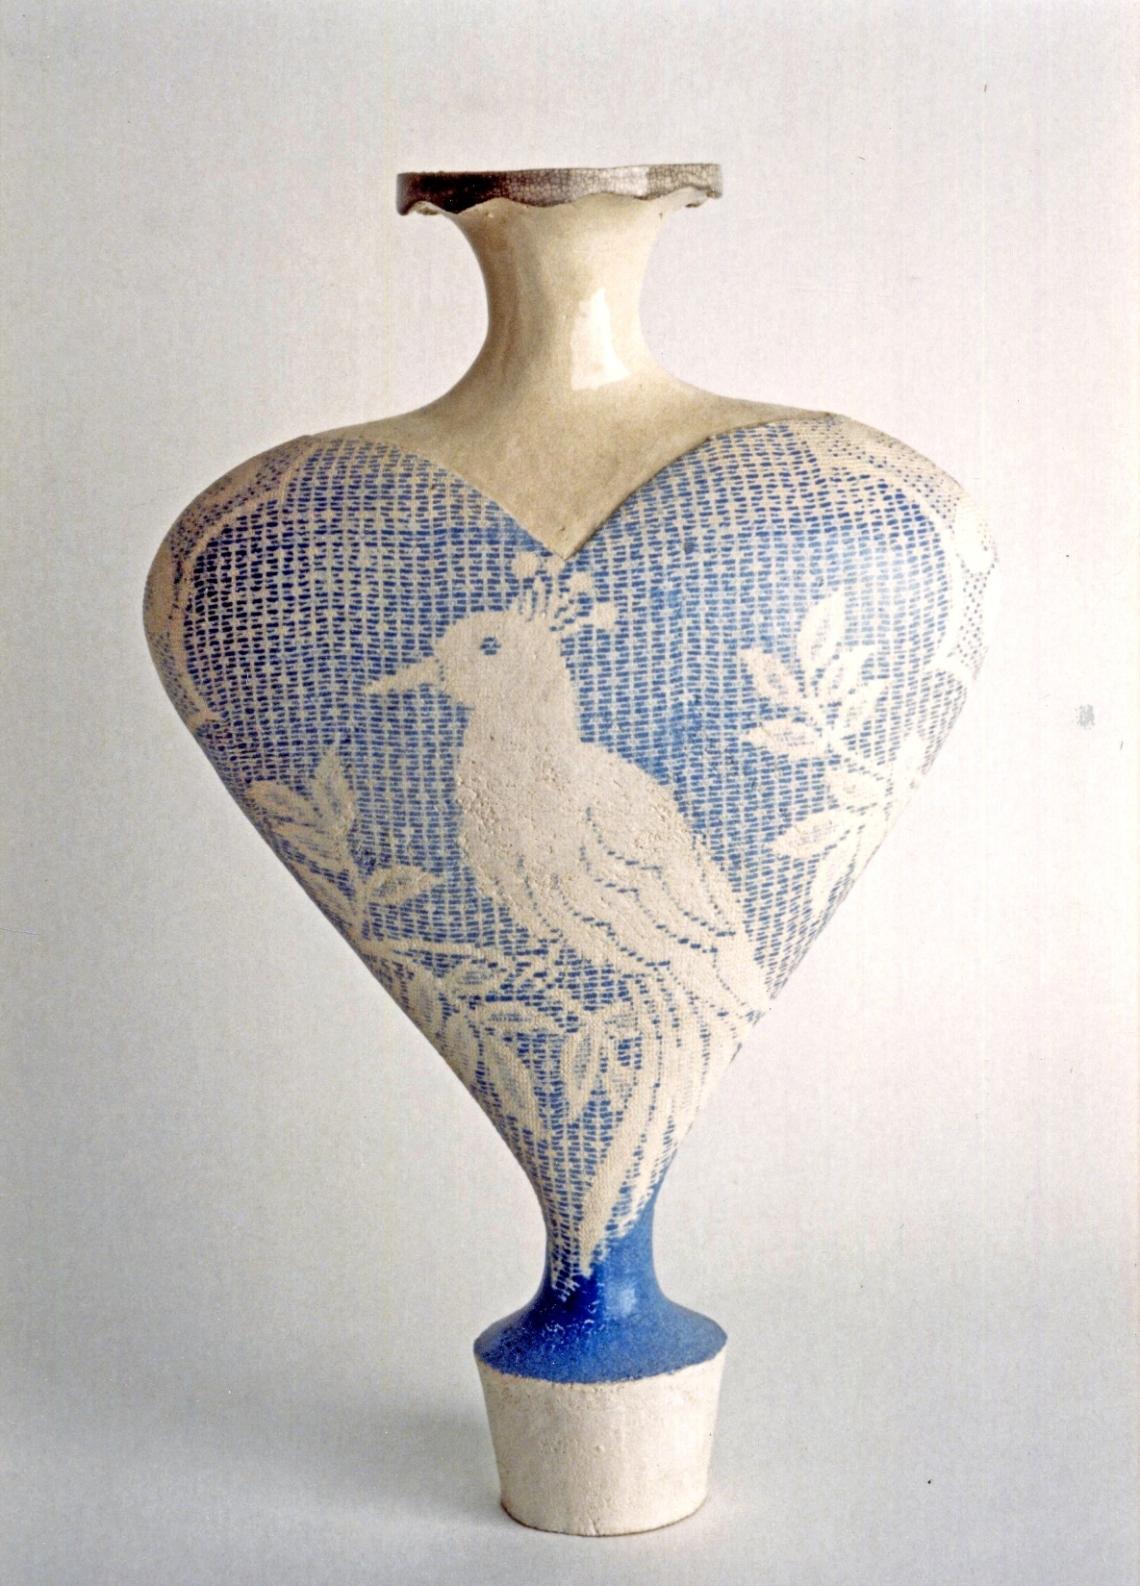 Francesca di Ciaula, vaas, 1994. Foto met dank aan Francesca di Ciaula©